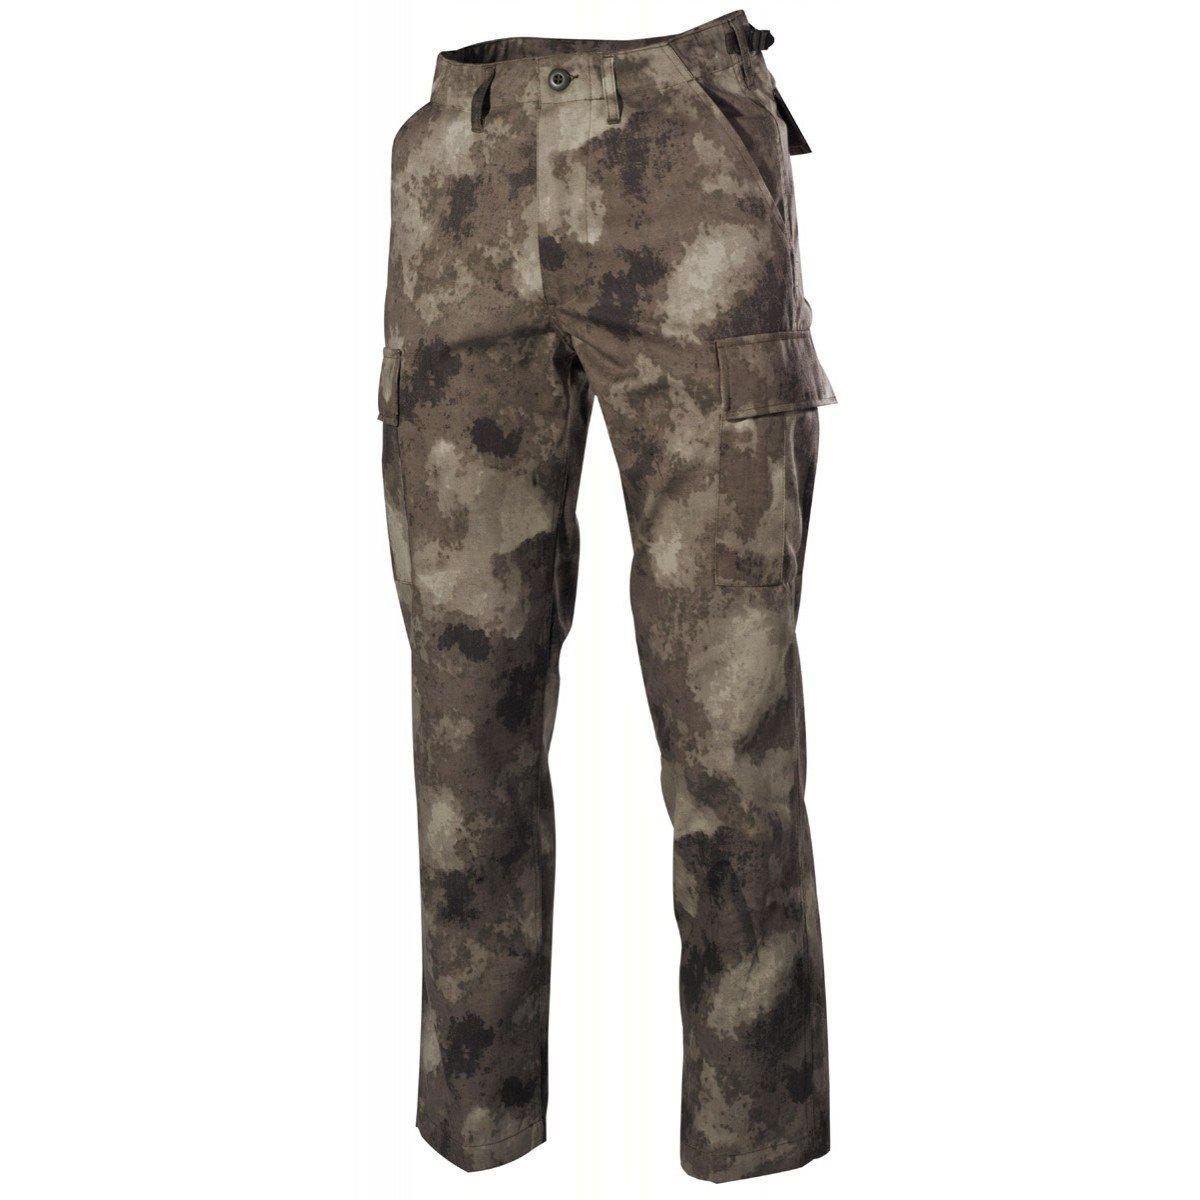 MFH int. comp. | Kalhoty US střih BDU HDT CAMO vel.XL